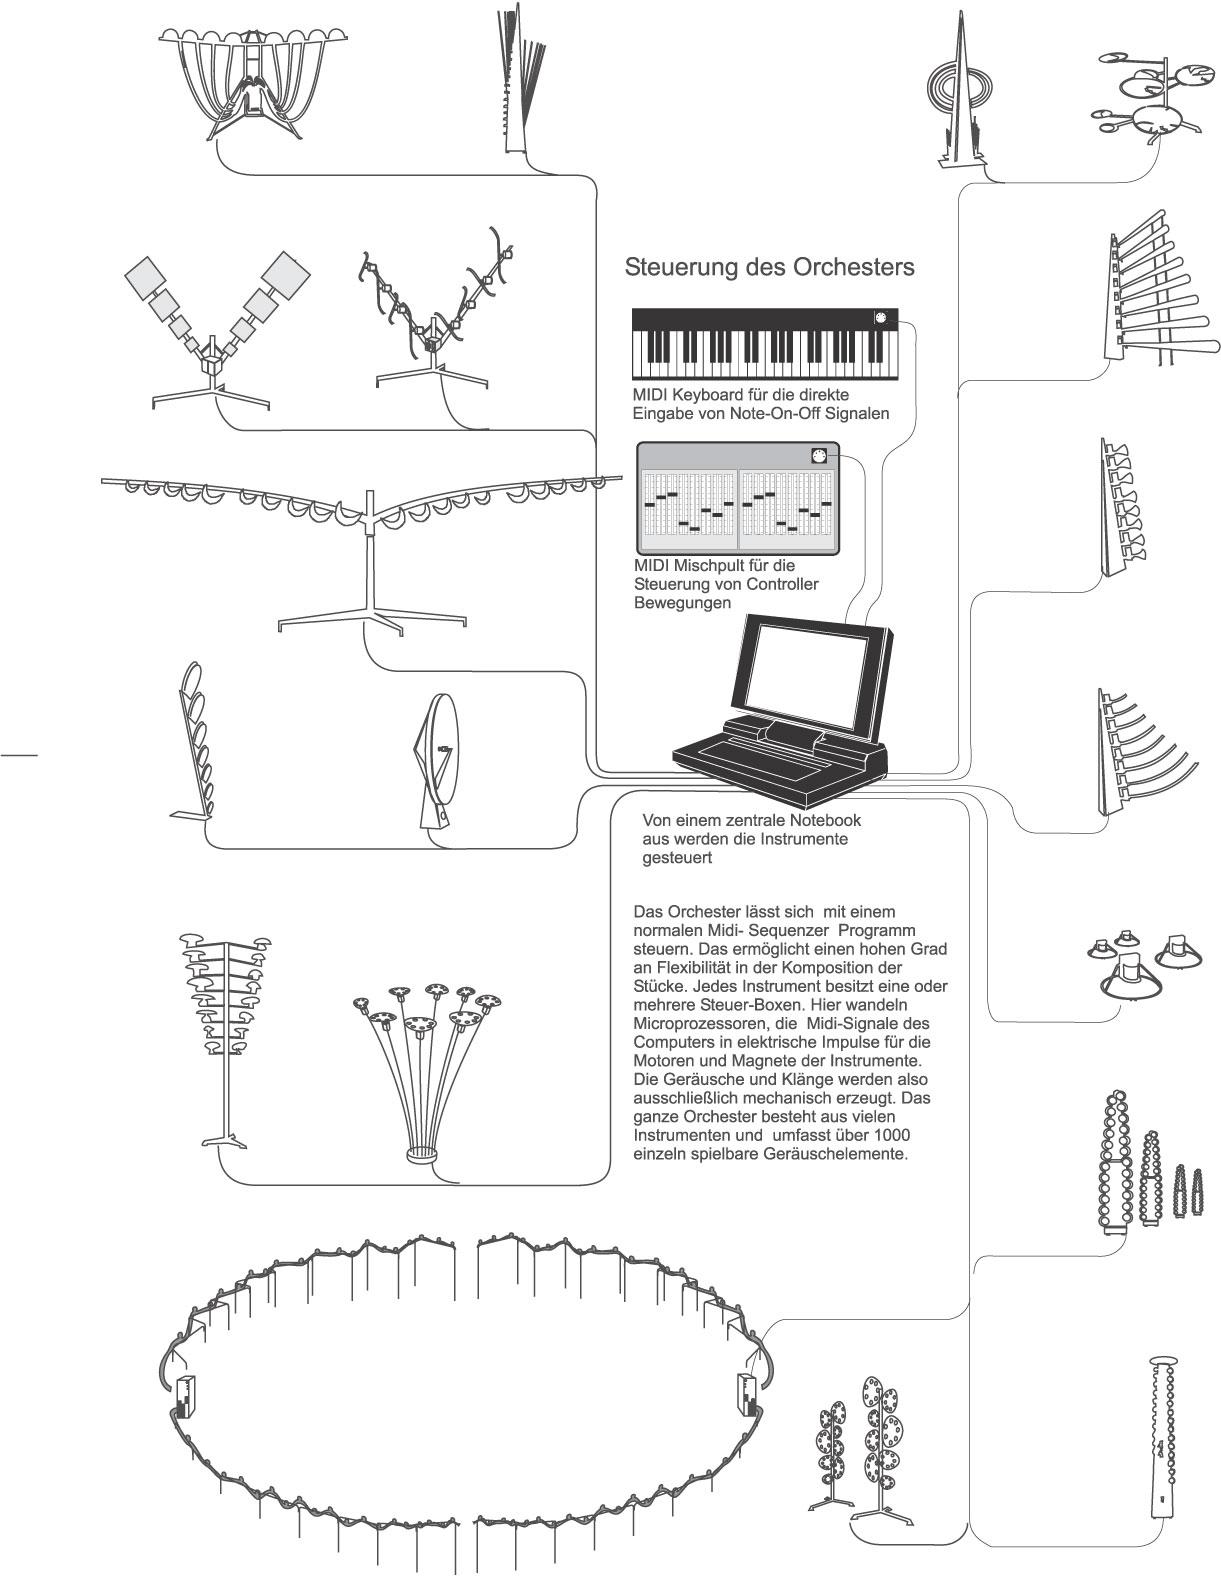 Wunderbar Elektrische Notation Ideen - Schaltplan Serie Circuit ...